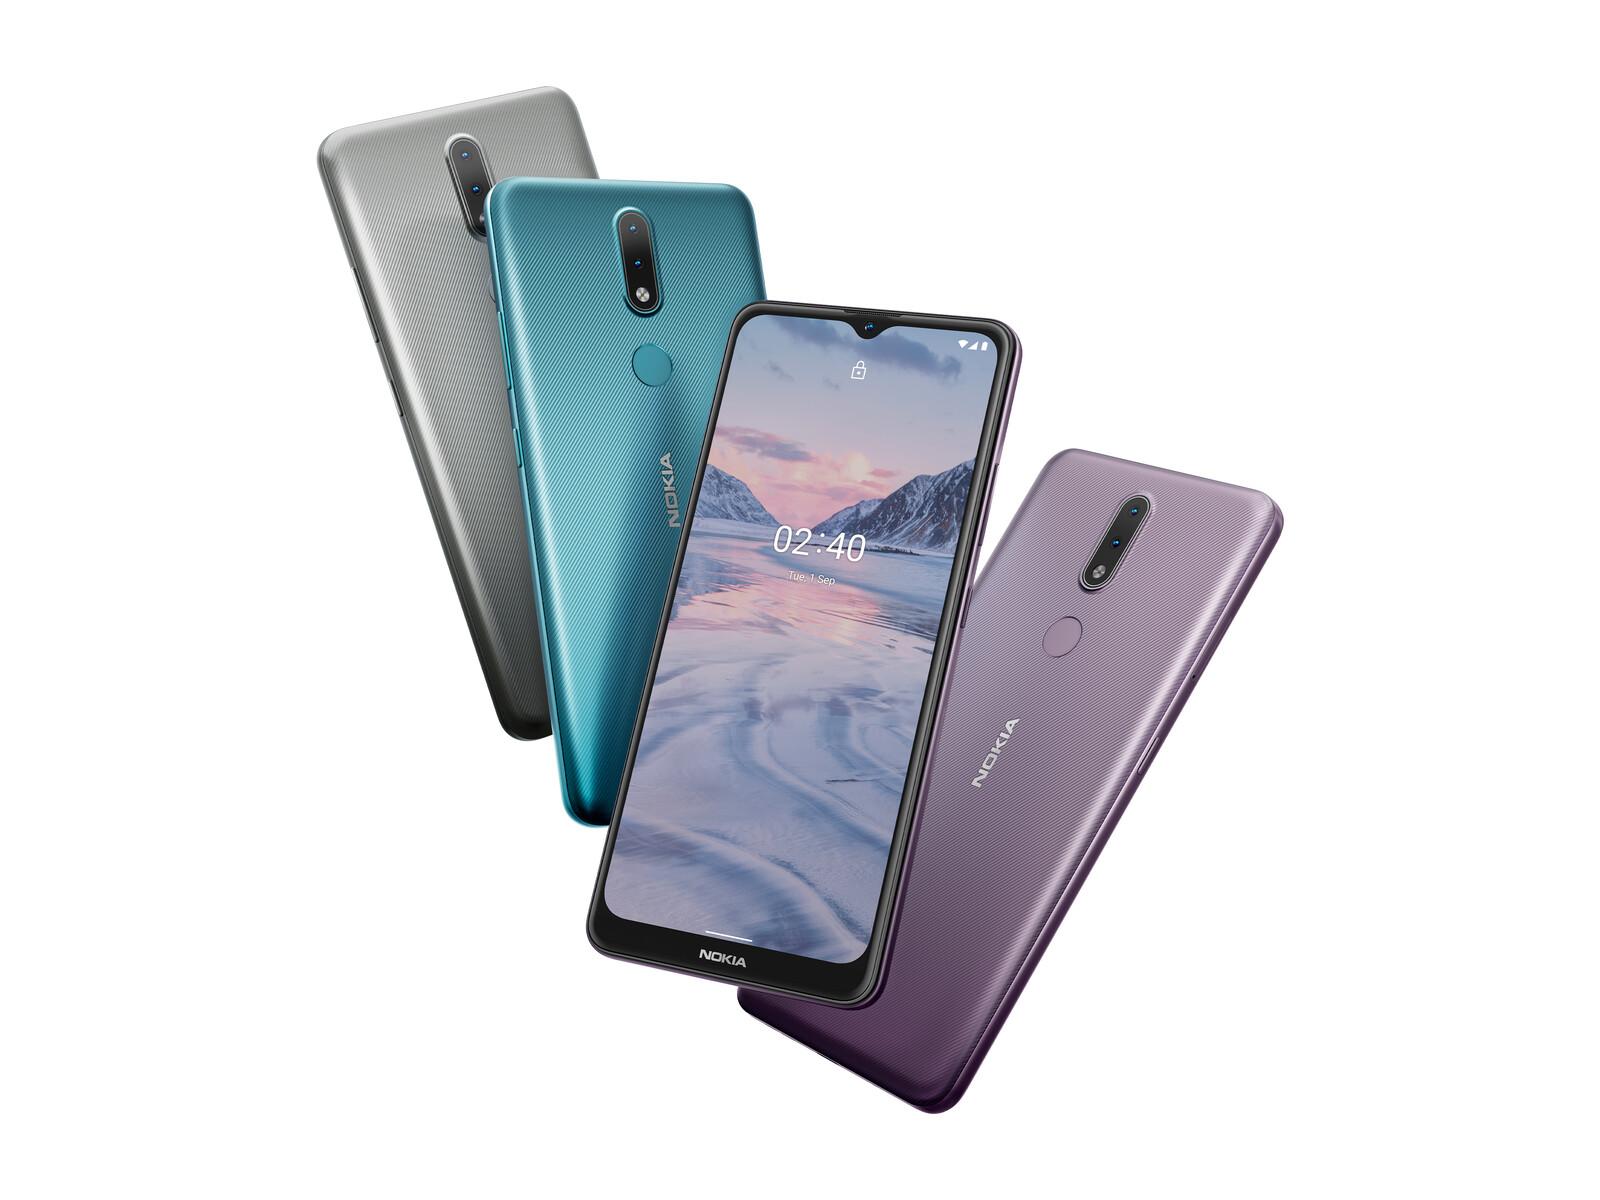 Nokia 2.4 - Notebookcheck.info